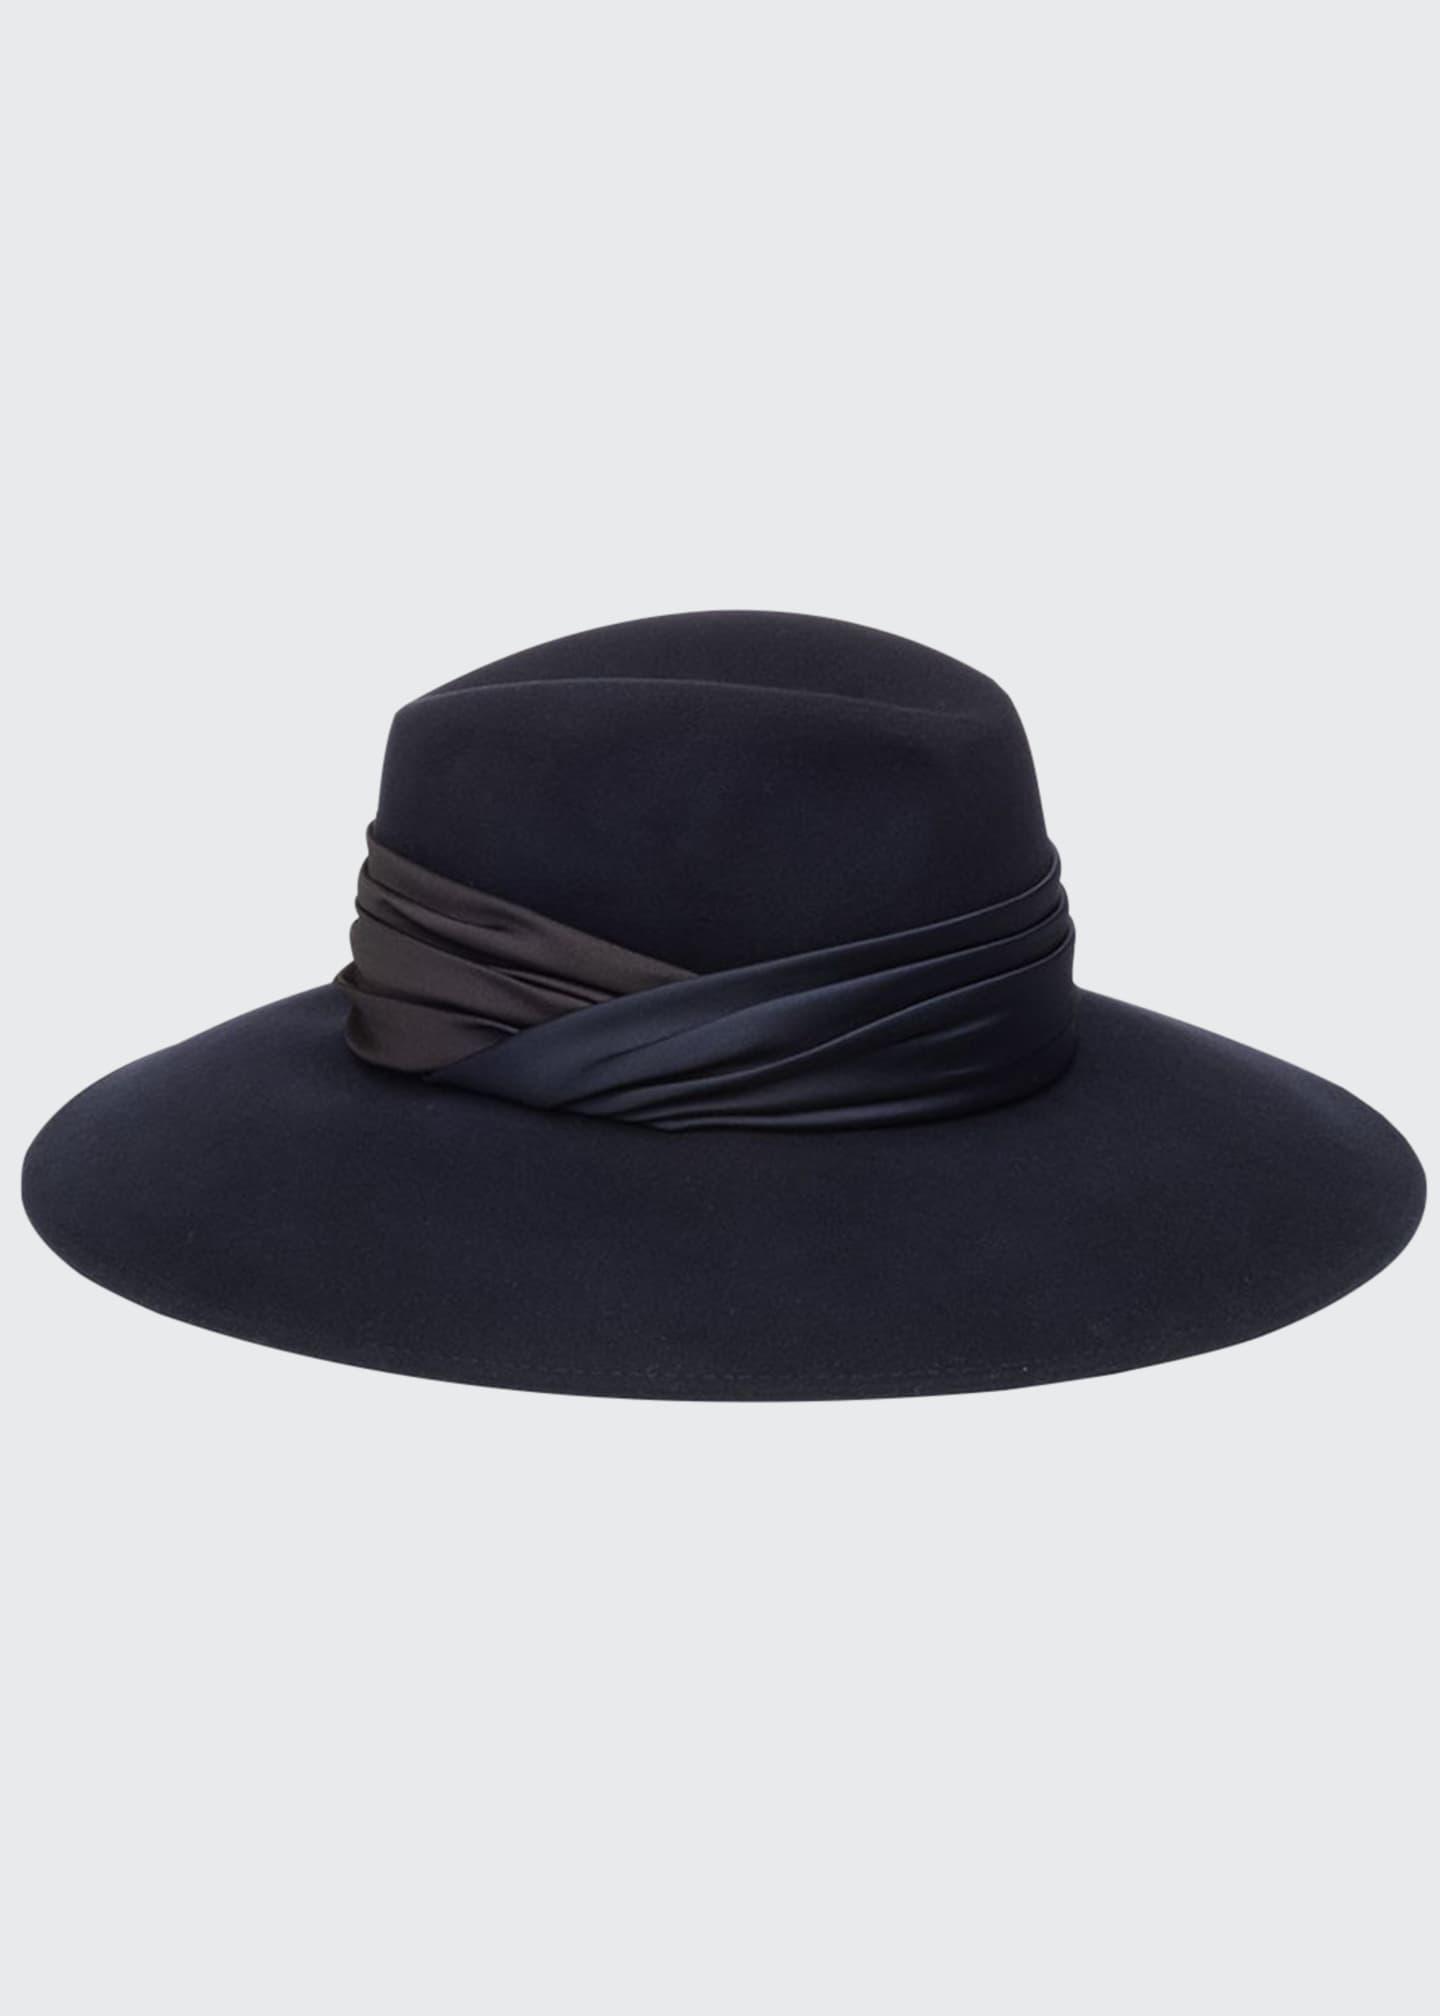 Eugenia Kim Emmanuelle Wool Fedora Hat w/ Ruched